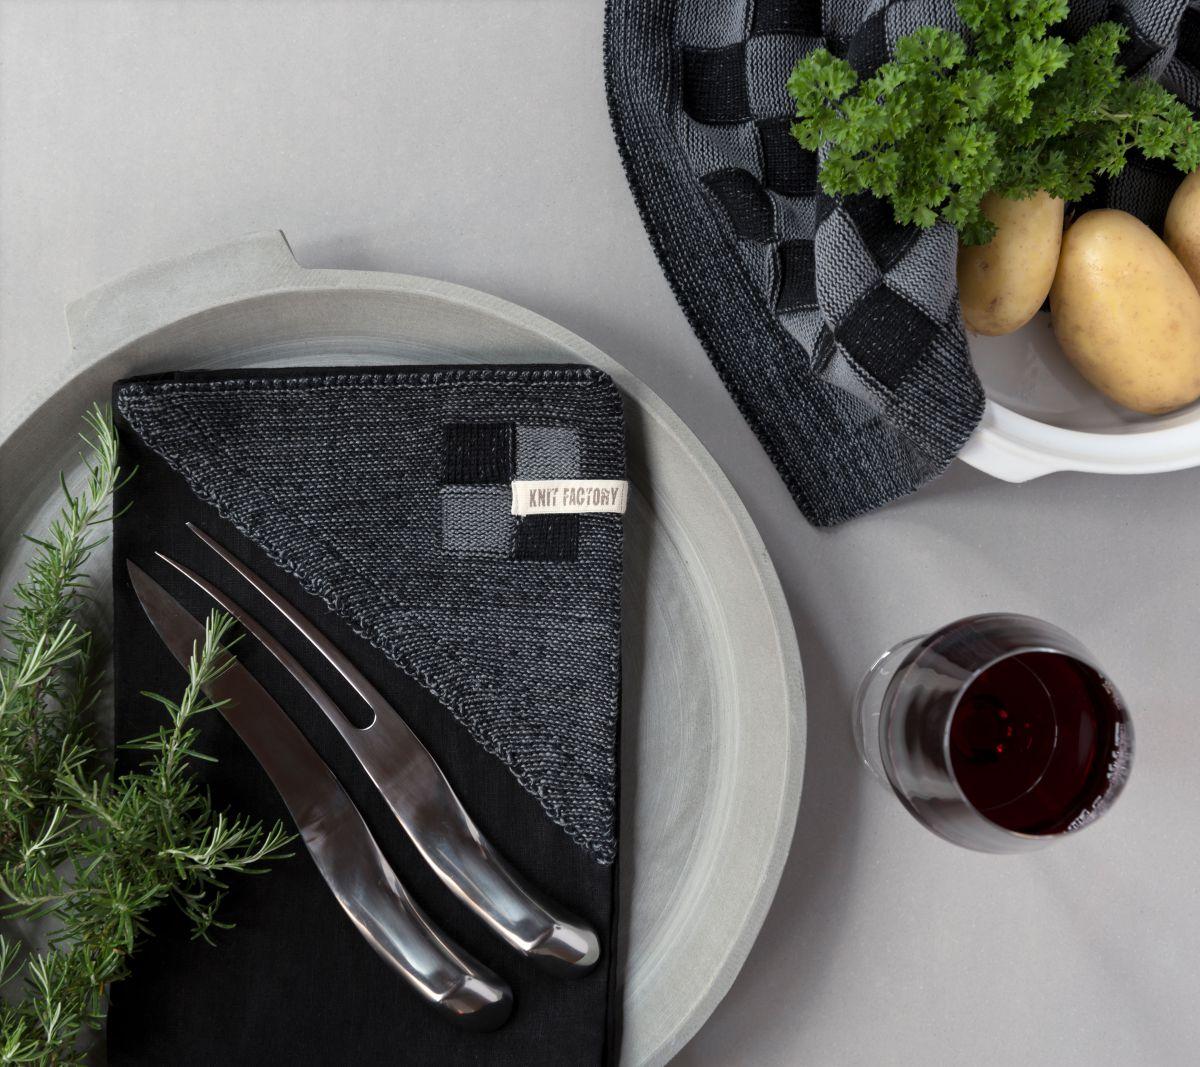 20100 knit factory keukendoek block zwart 8